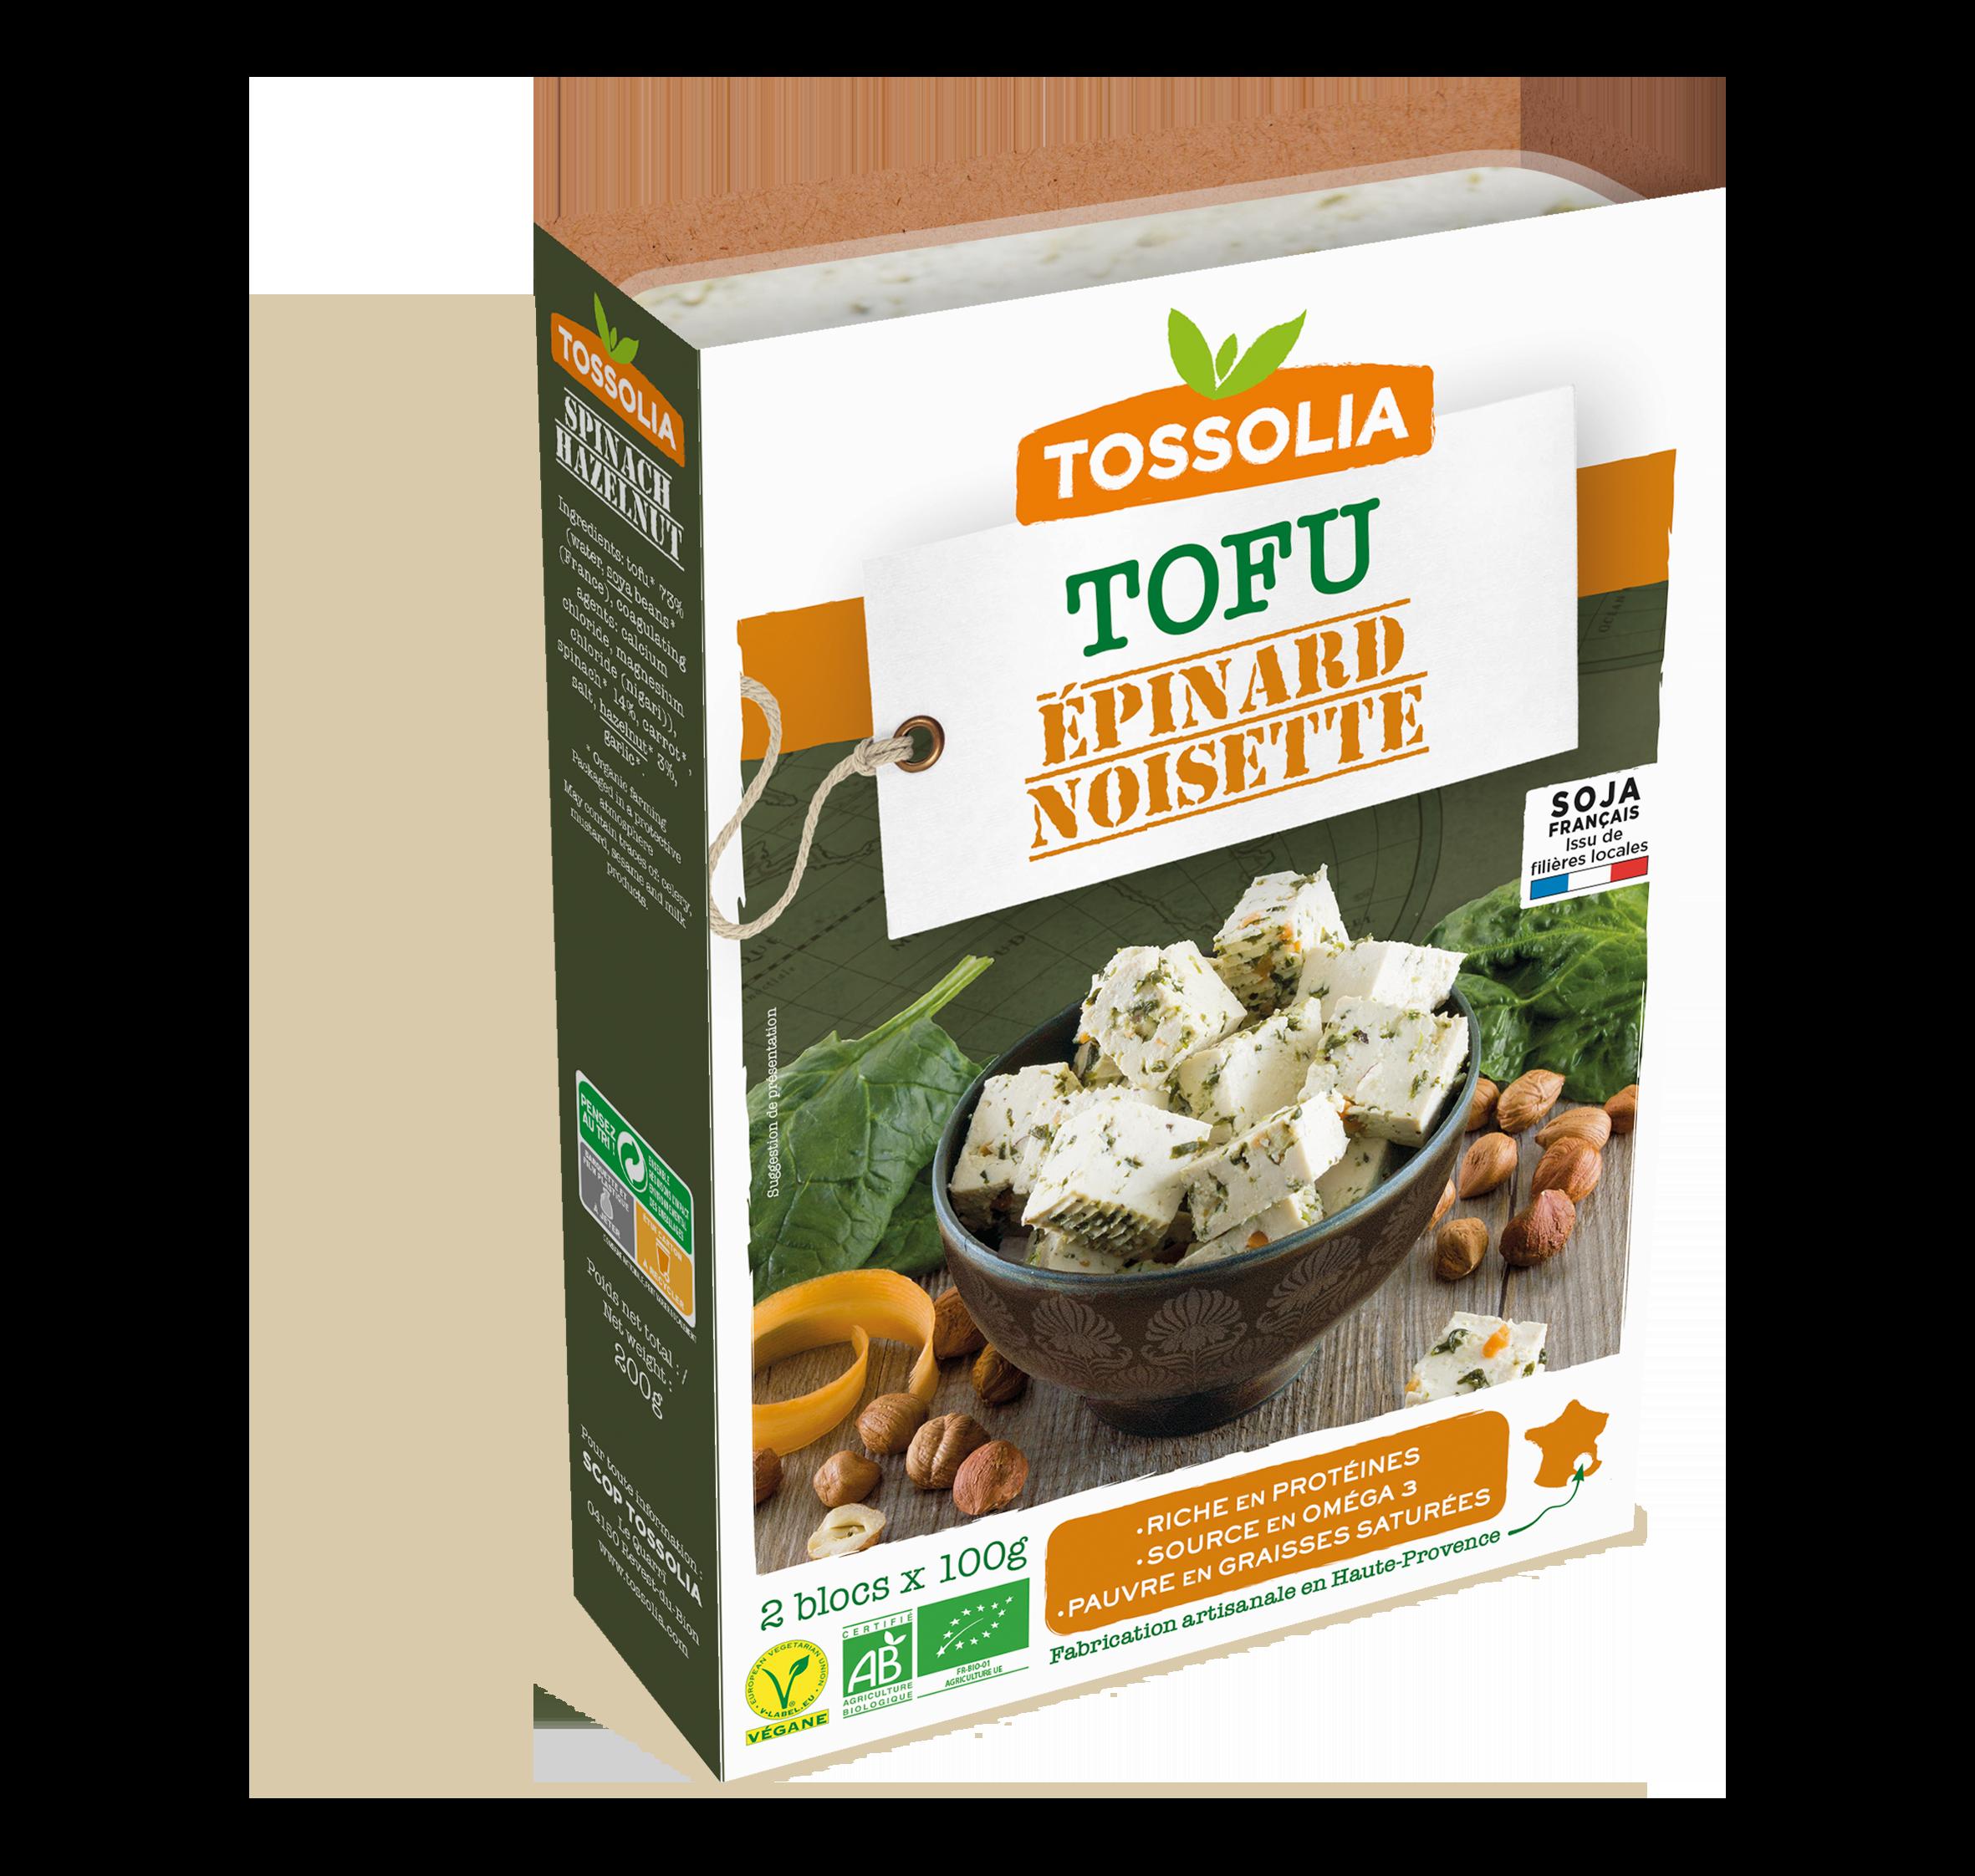 Tofu épinard noisette